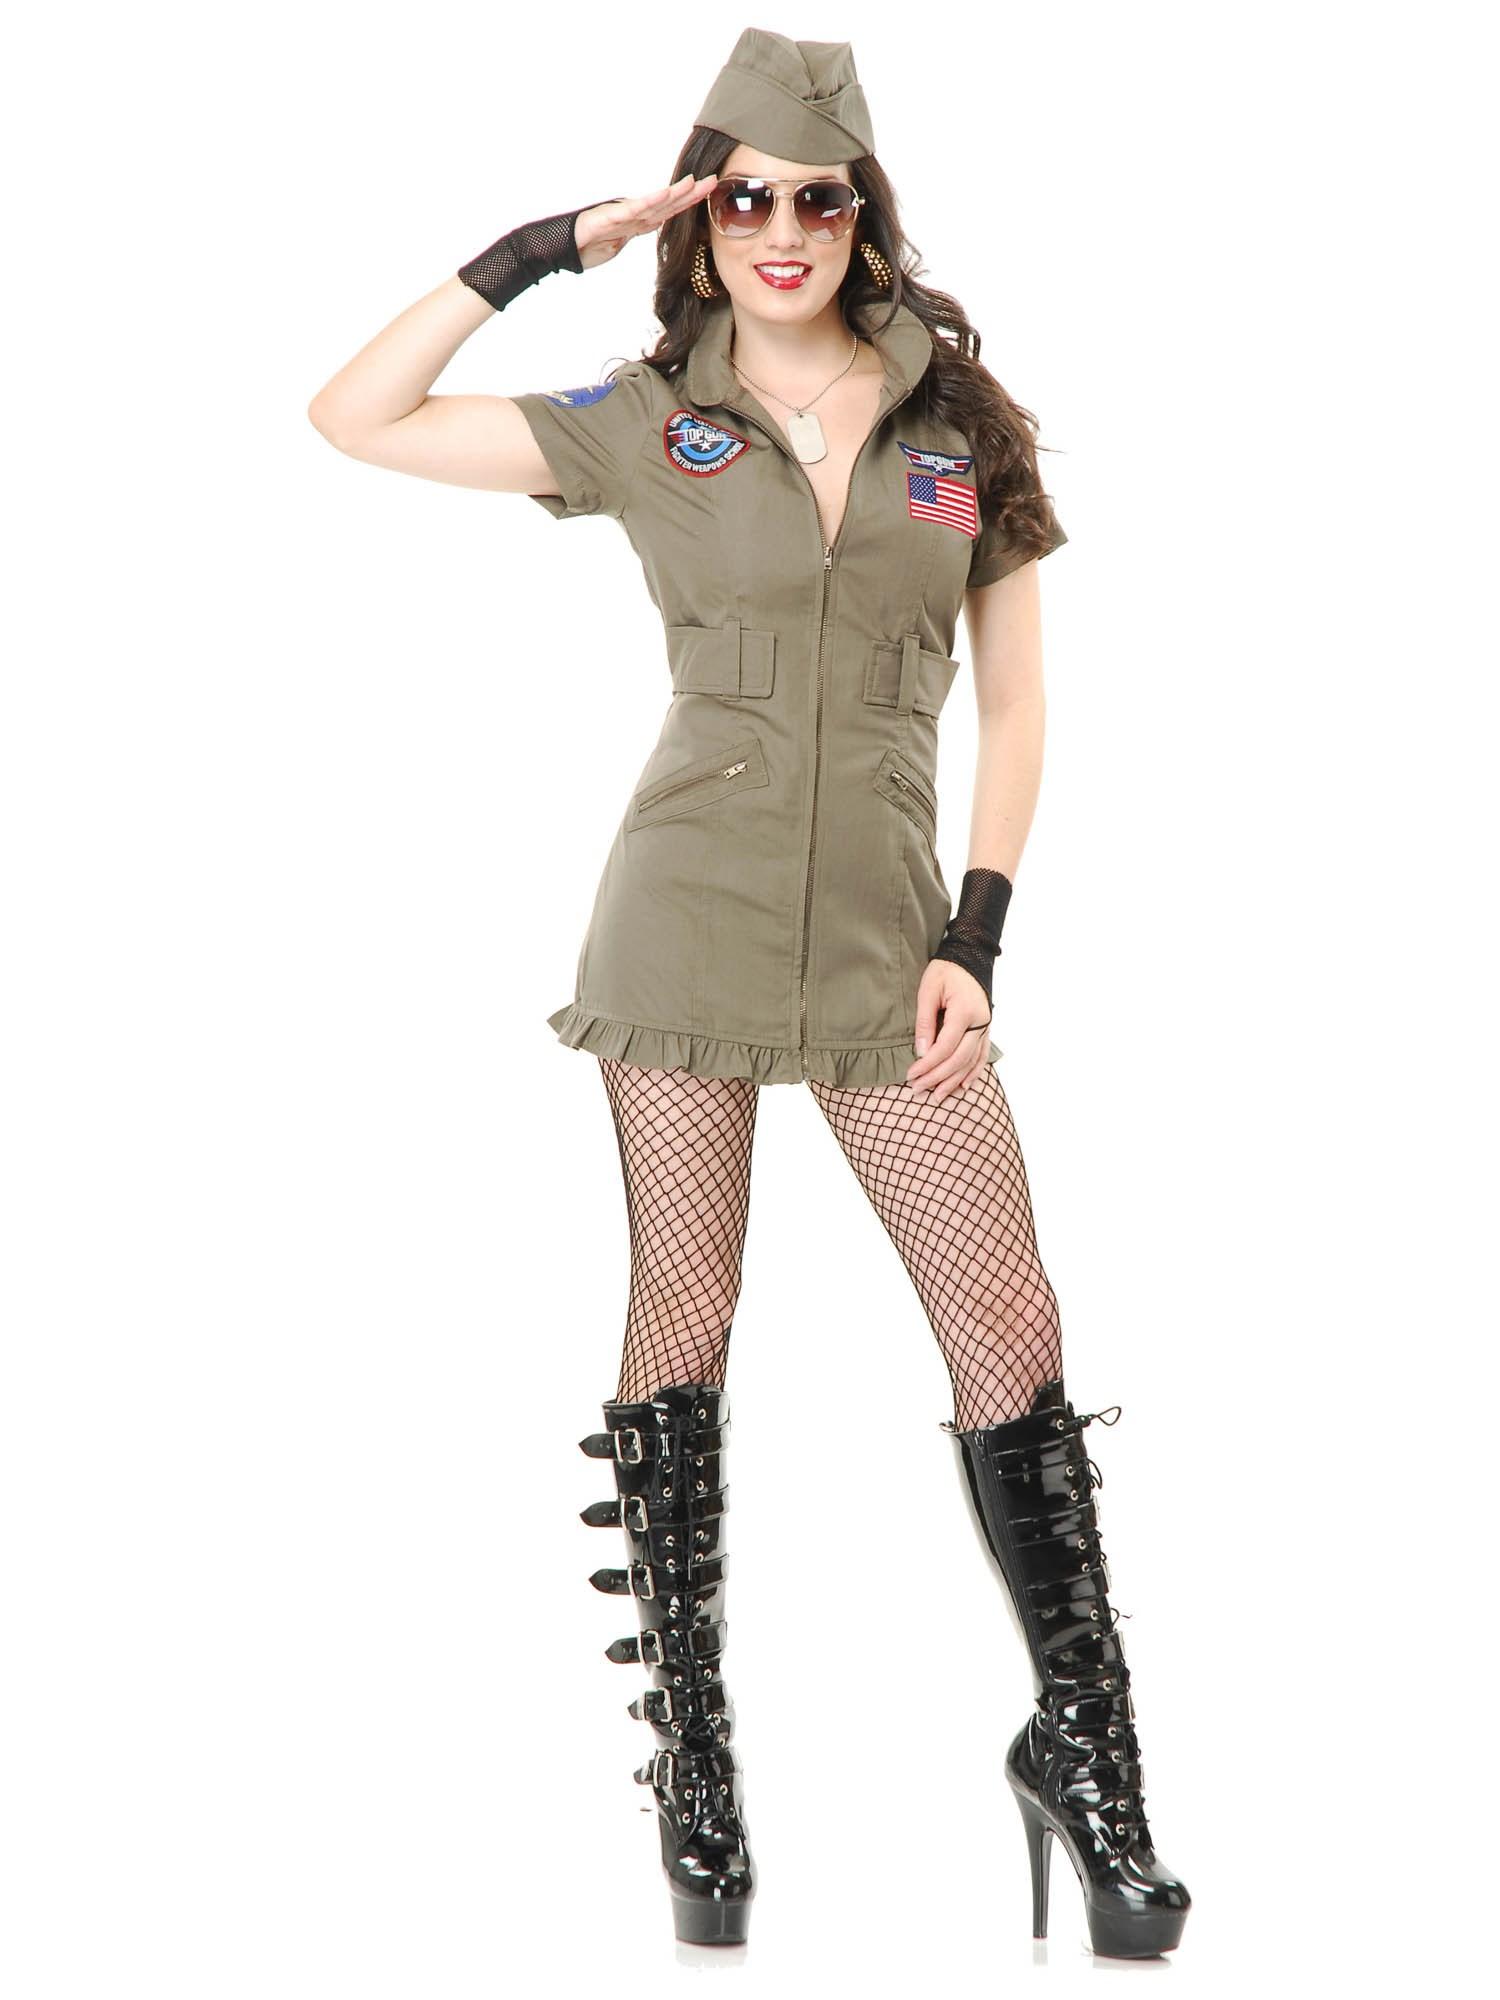 Top Gun Flight Costume Dress For Women | BuyCostumes.com